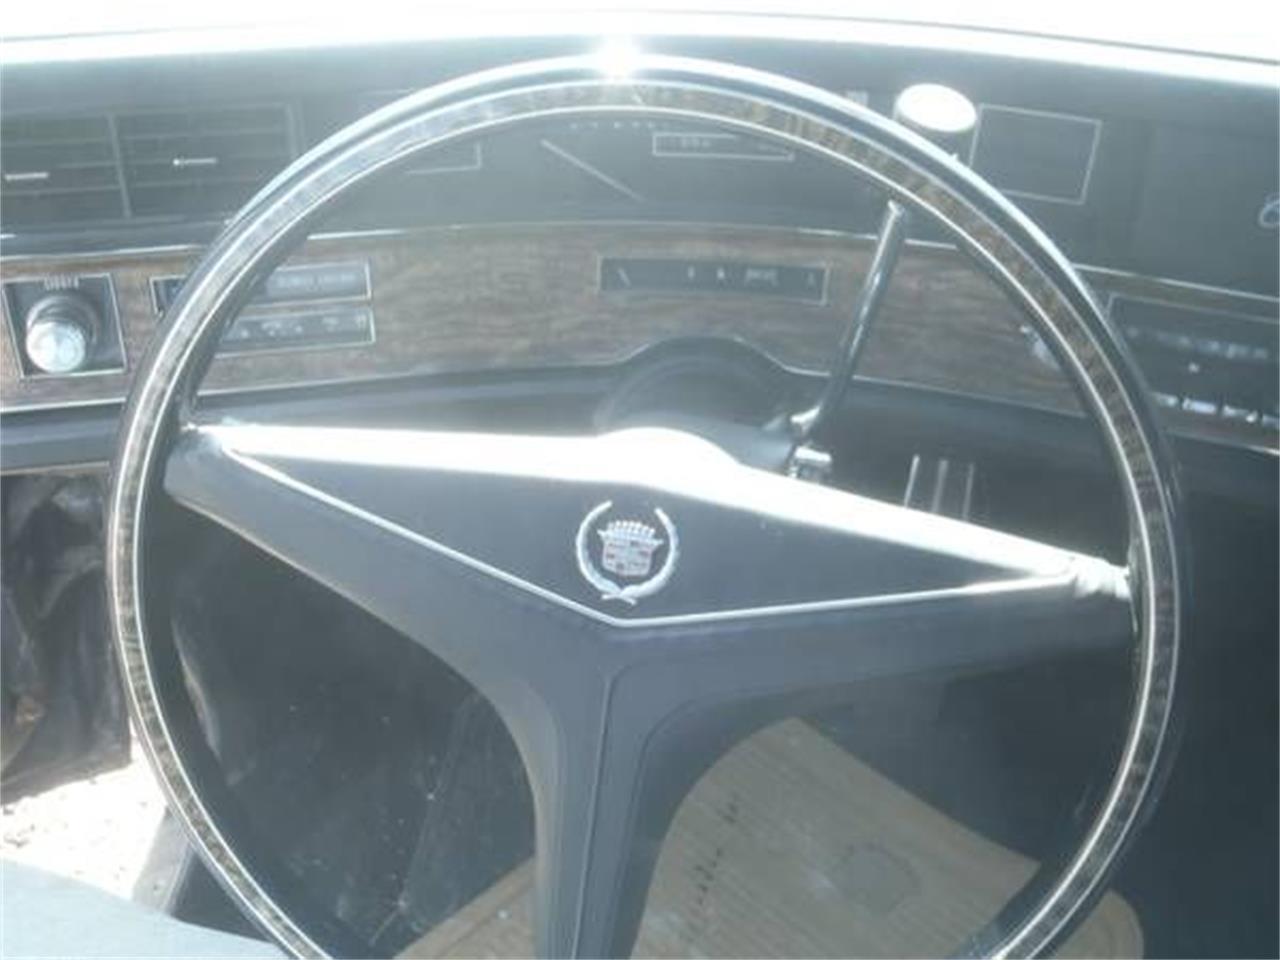 1971 Cadillac Fleetwood (CC-1345557) for sale in Cadillac, Michigan